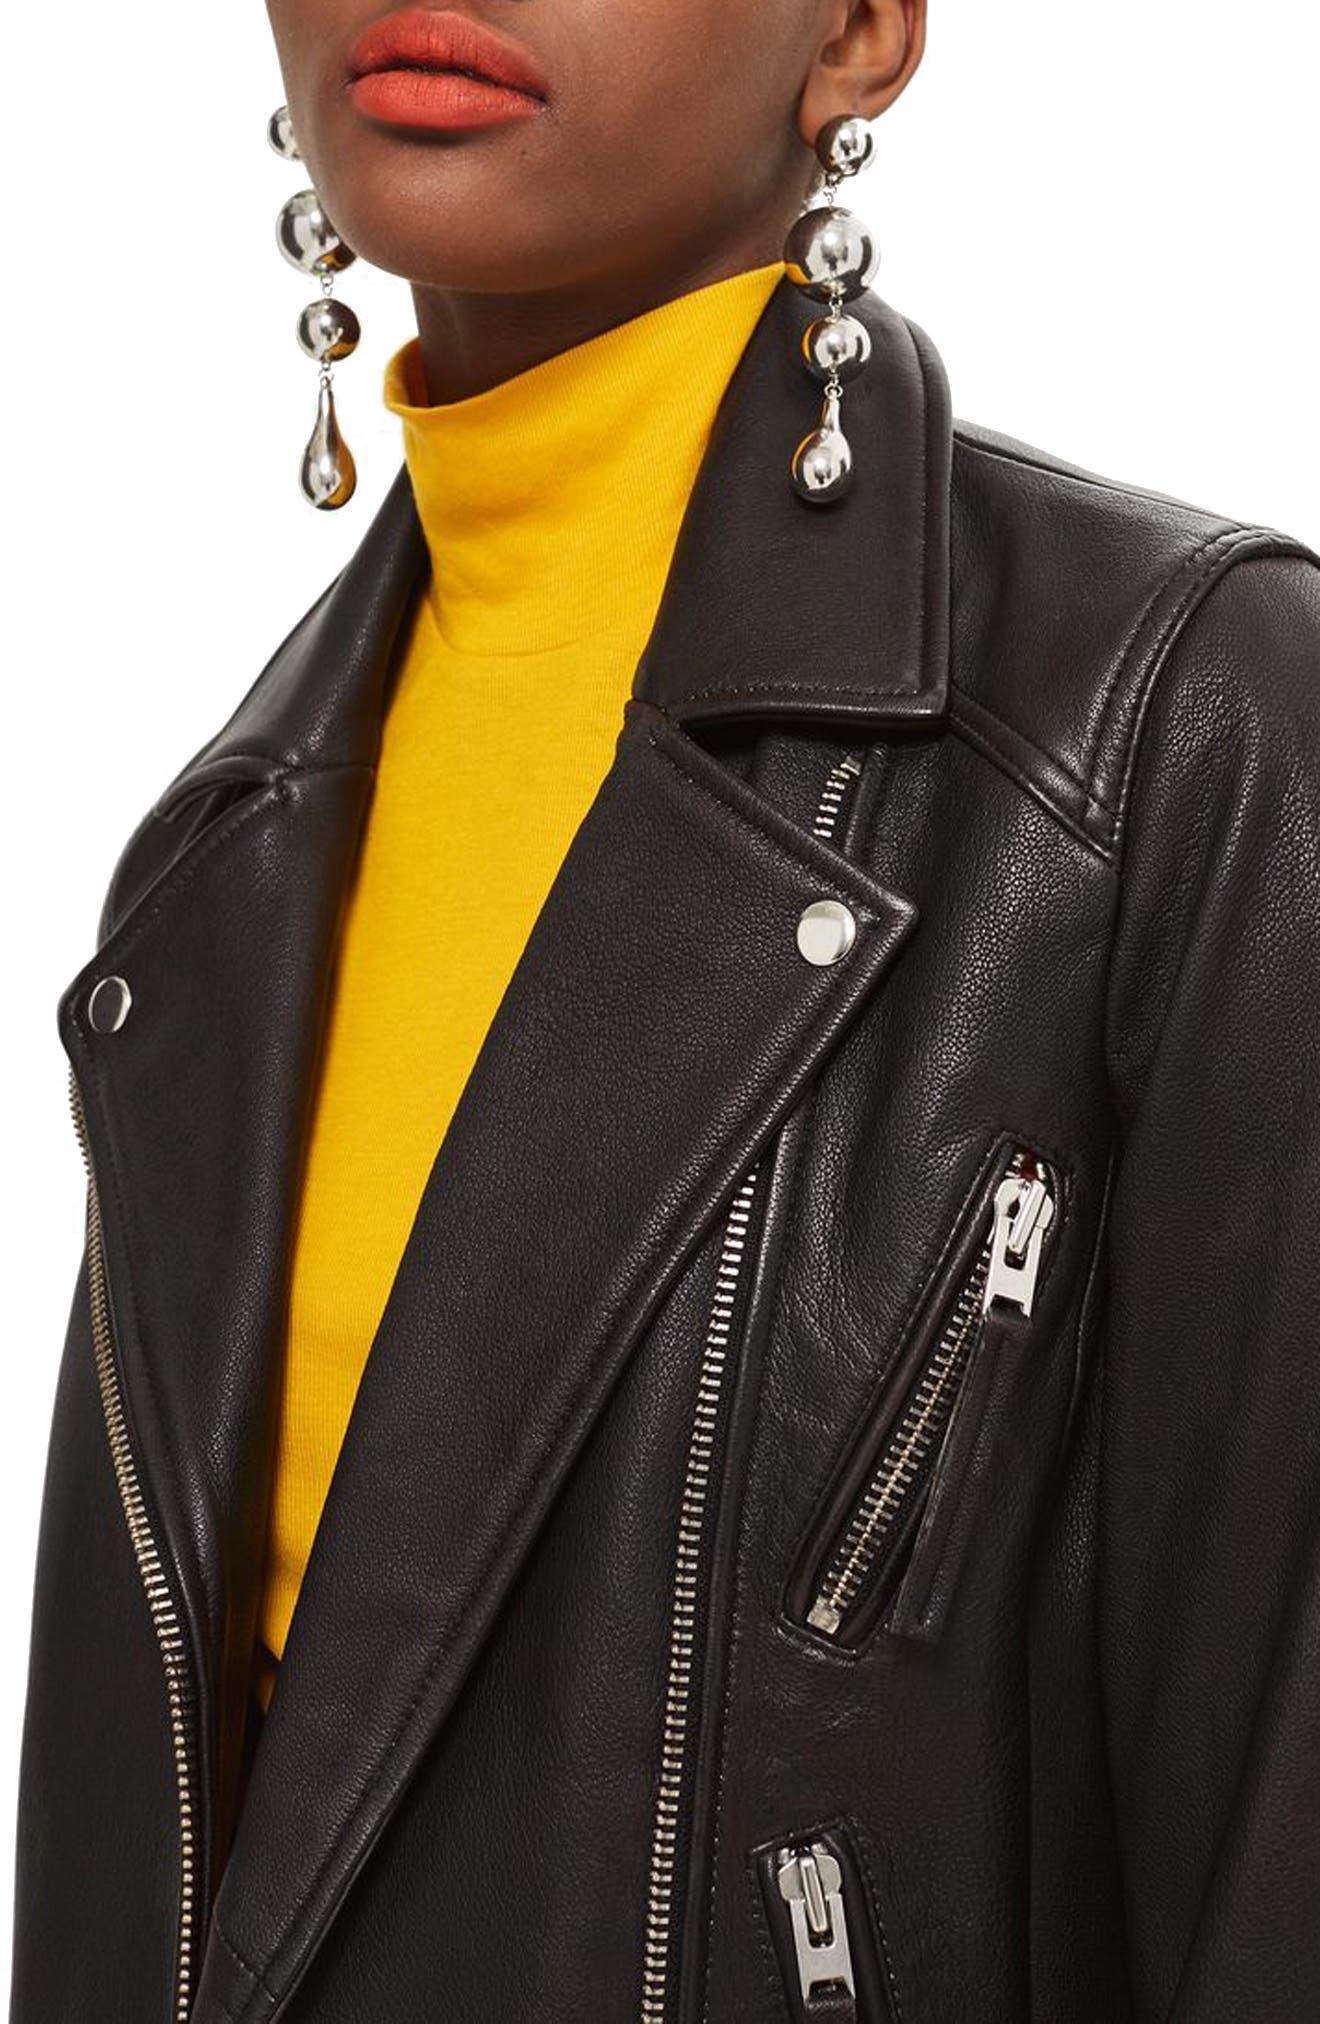 TOPSHOP, Dolly Leather Biker Jacket, Alternate thumbnail 4, color, BLACK